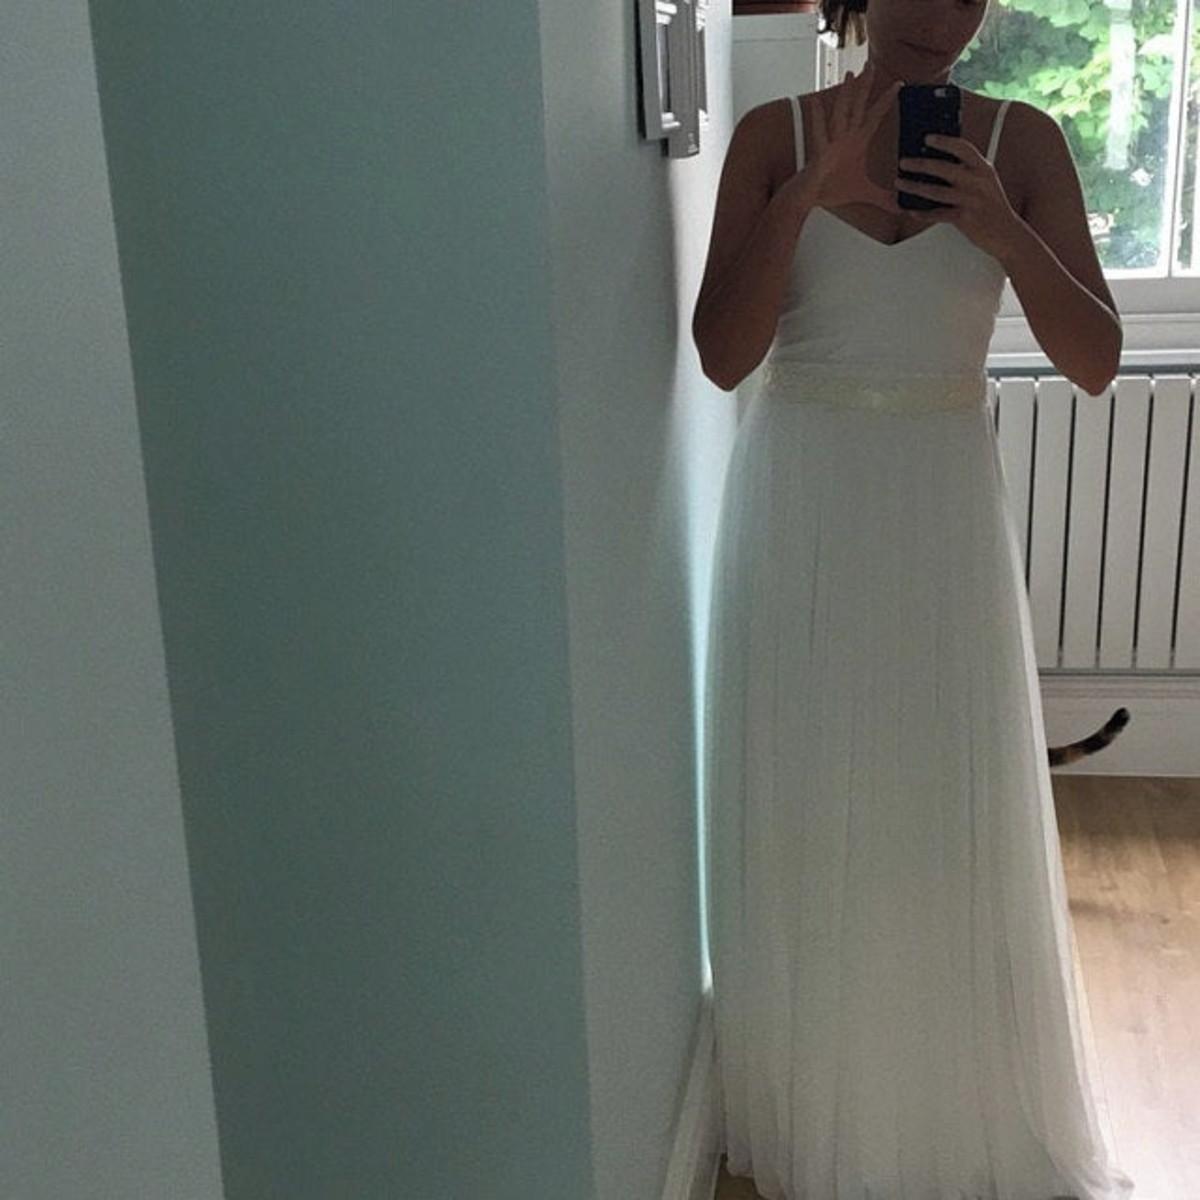 Vestido Noiva Boho Erva Doce CV Couture no Elo7 | Atelier